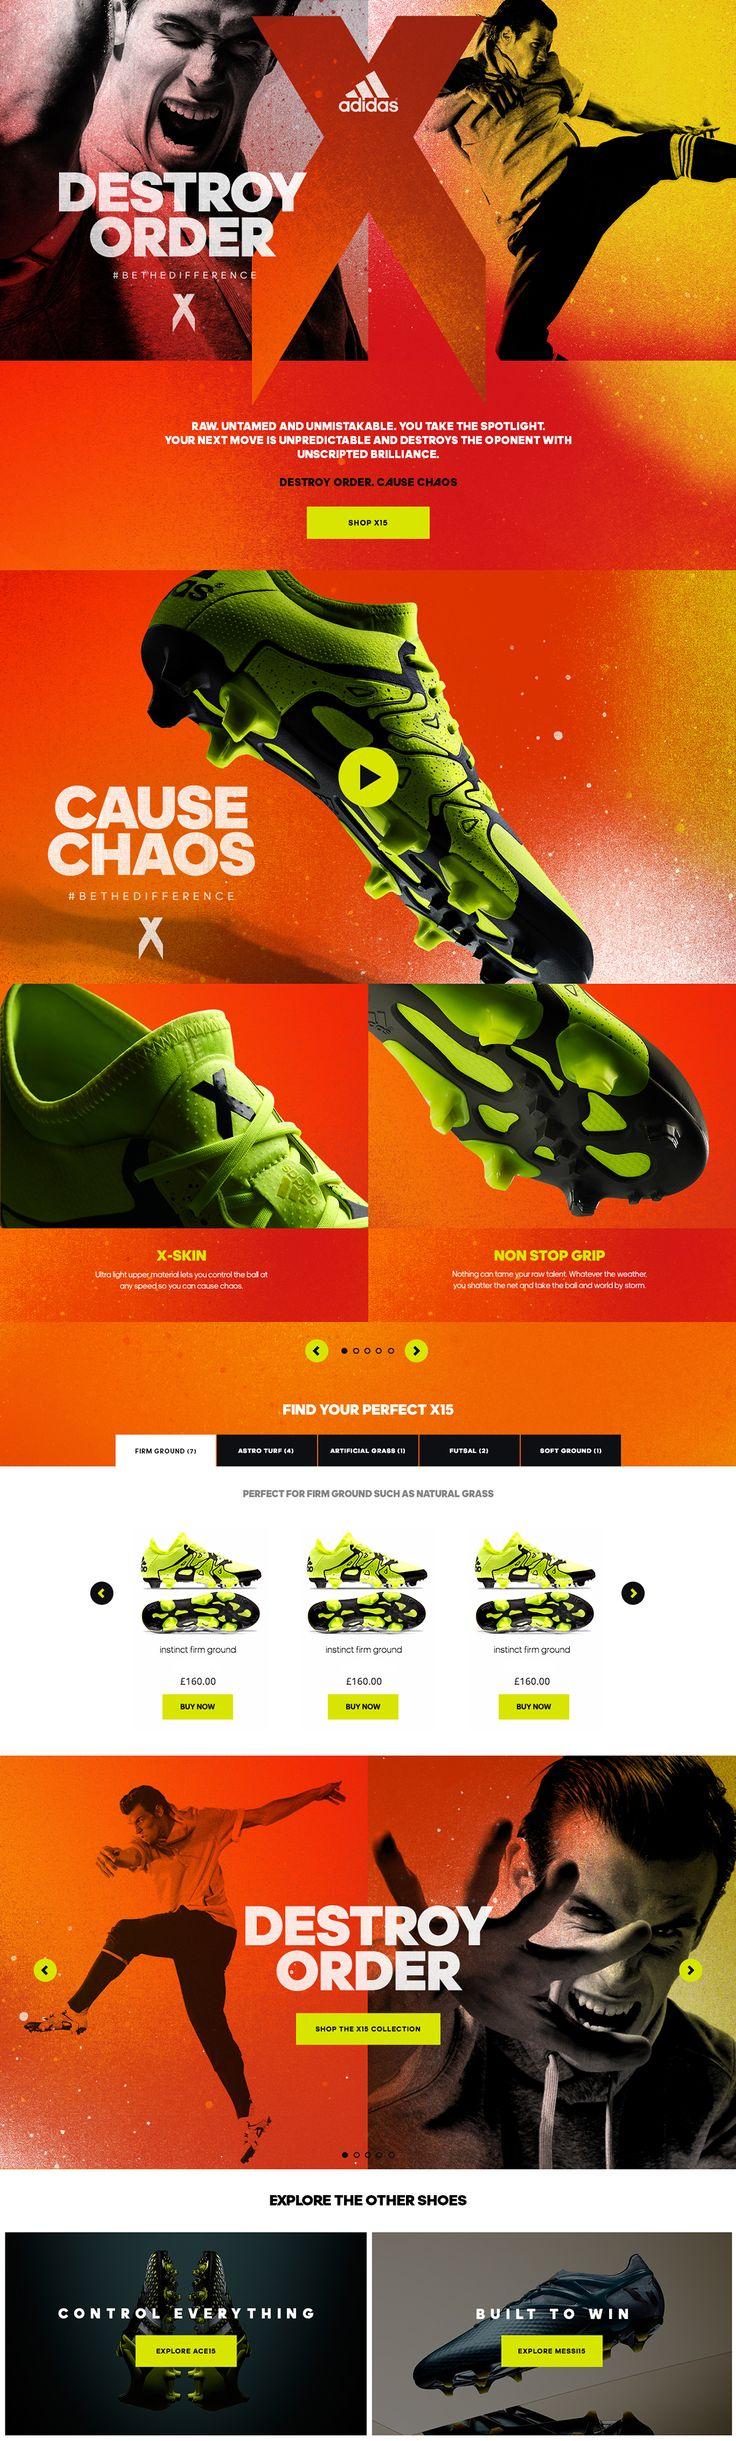 adidas - X15 & ACE15 on Behance